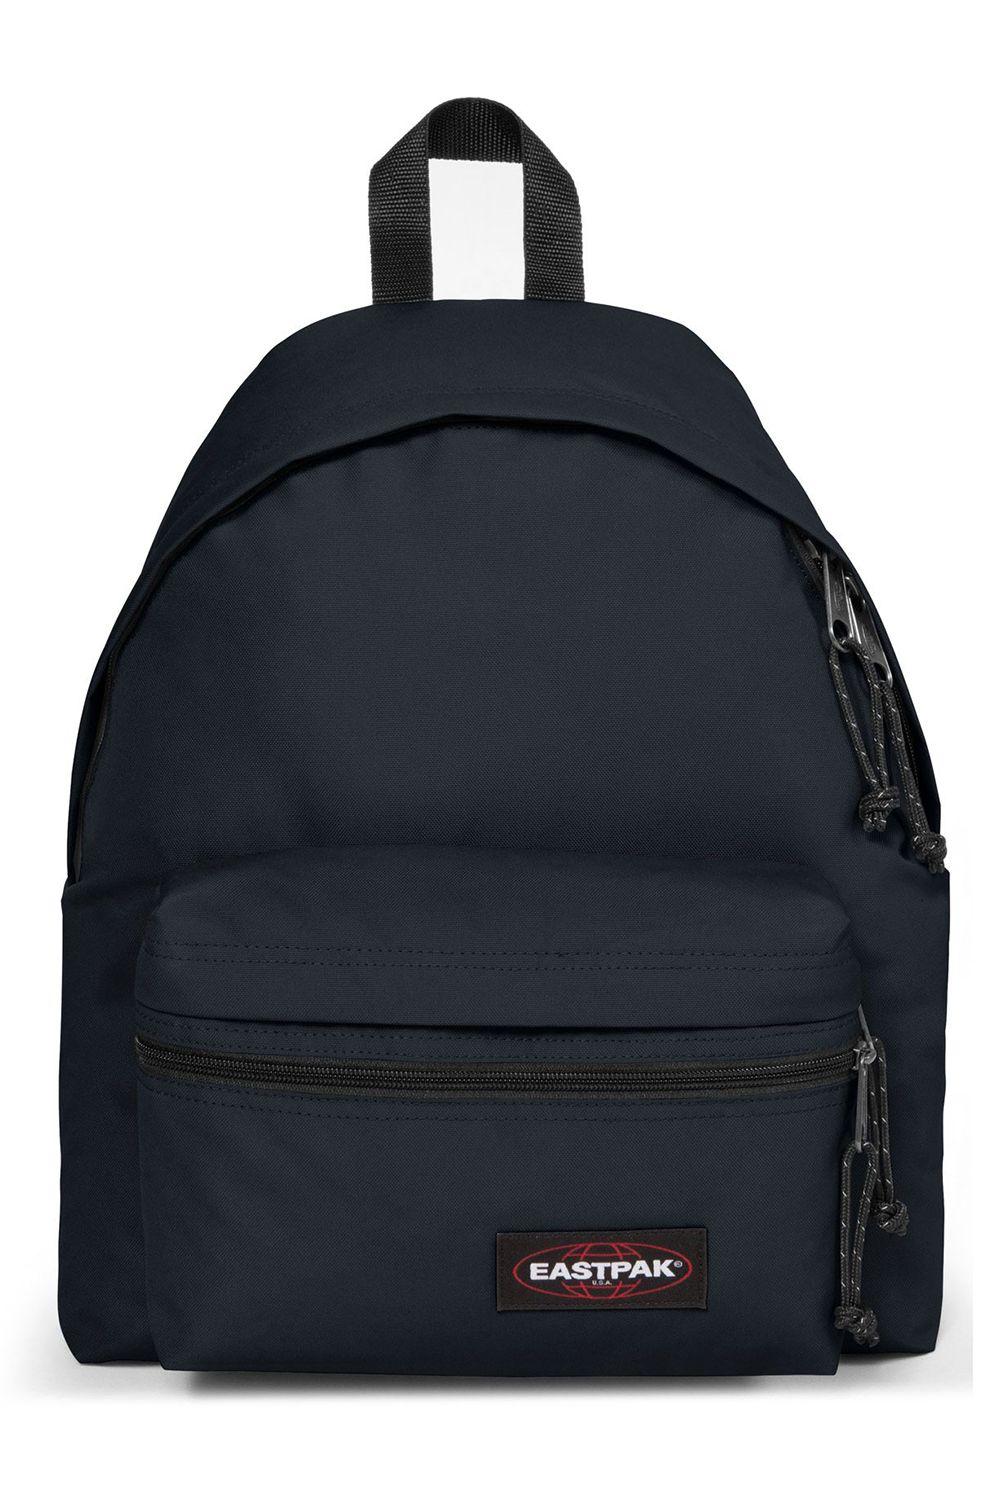 Eastpak Backpack PADDED ZIPPL'R Cloud Navy